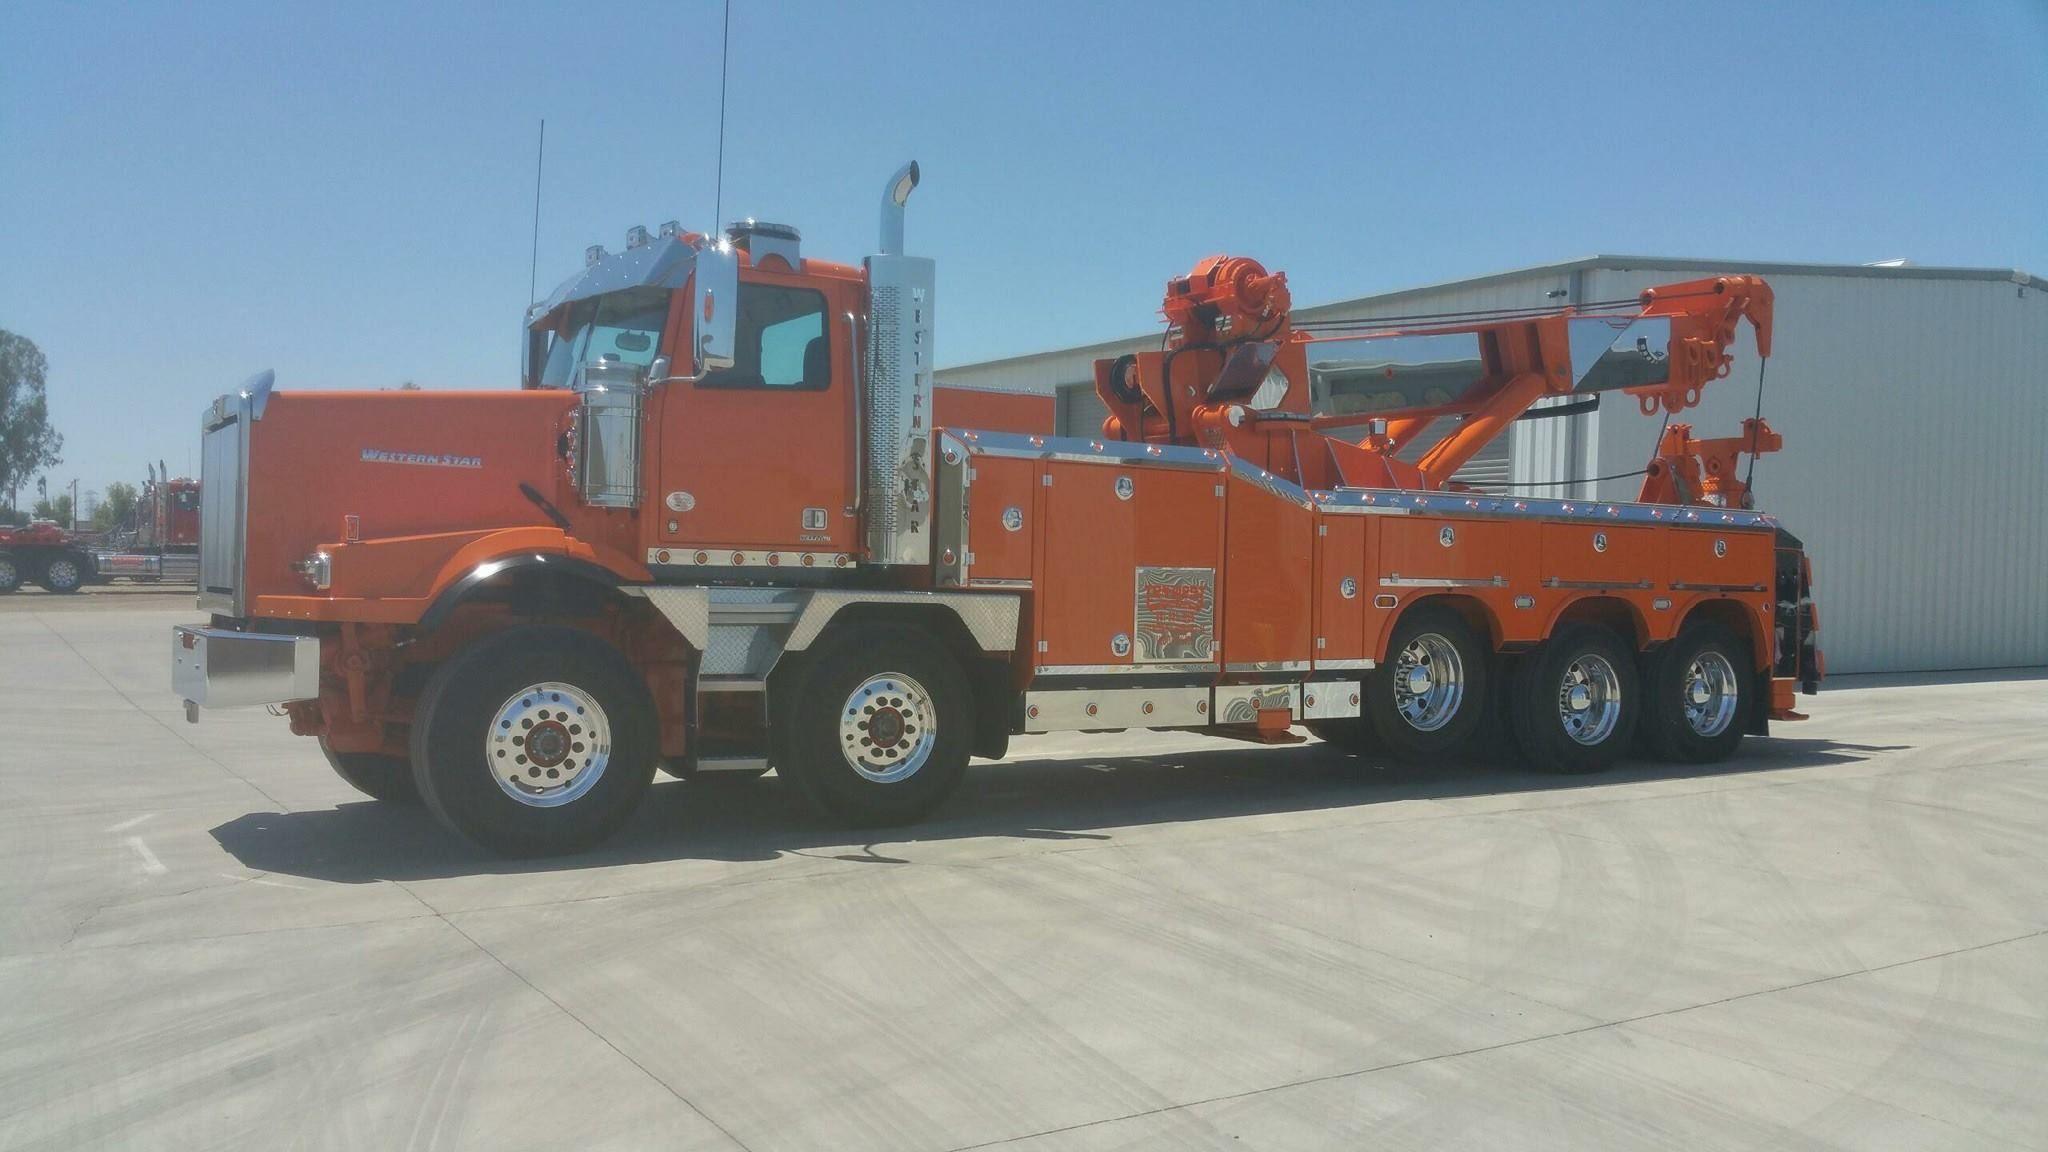 TenWest Towing, Bakersfield CA Western Star Twin Steer